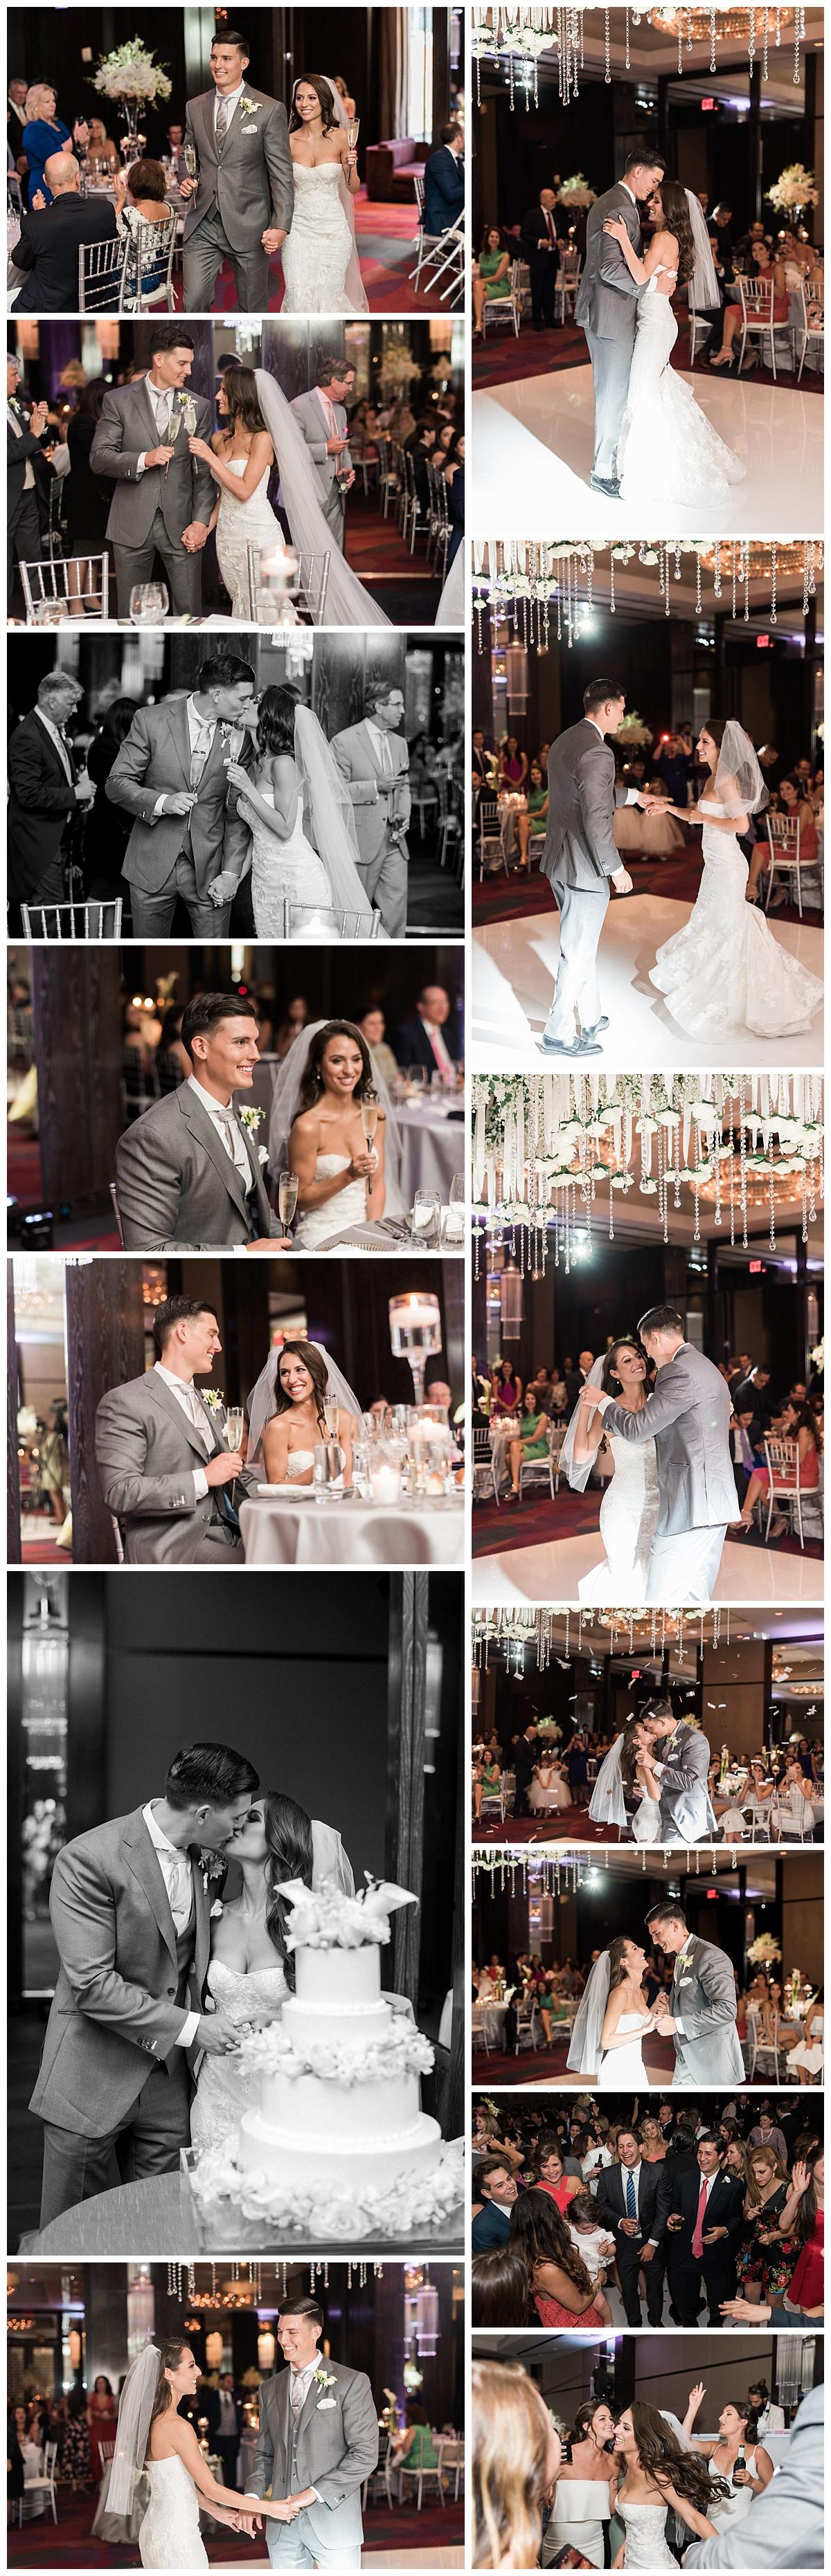 the-joule-dallas-wedding-ar-photography-9.jpg